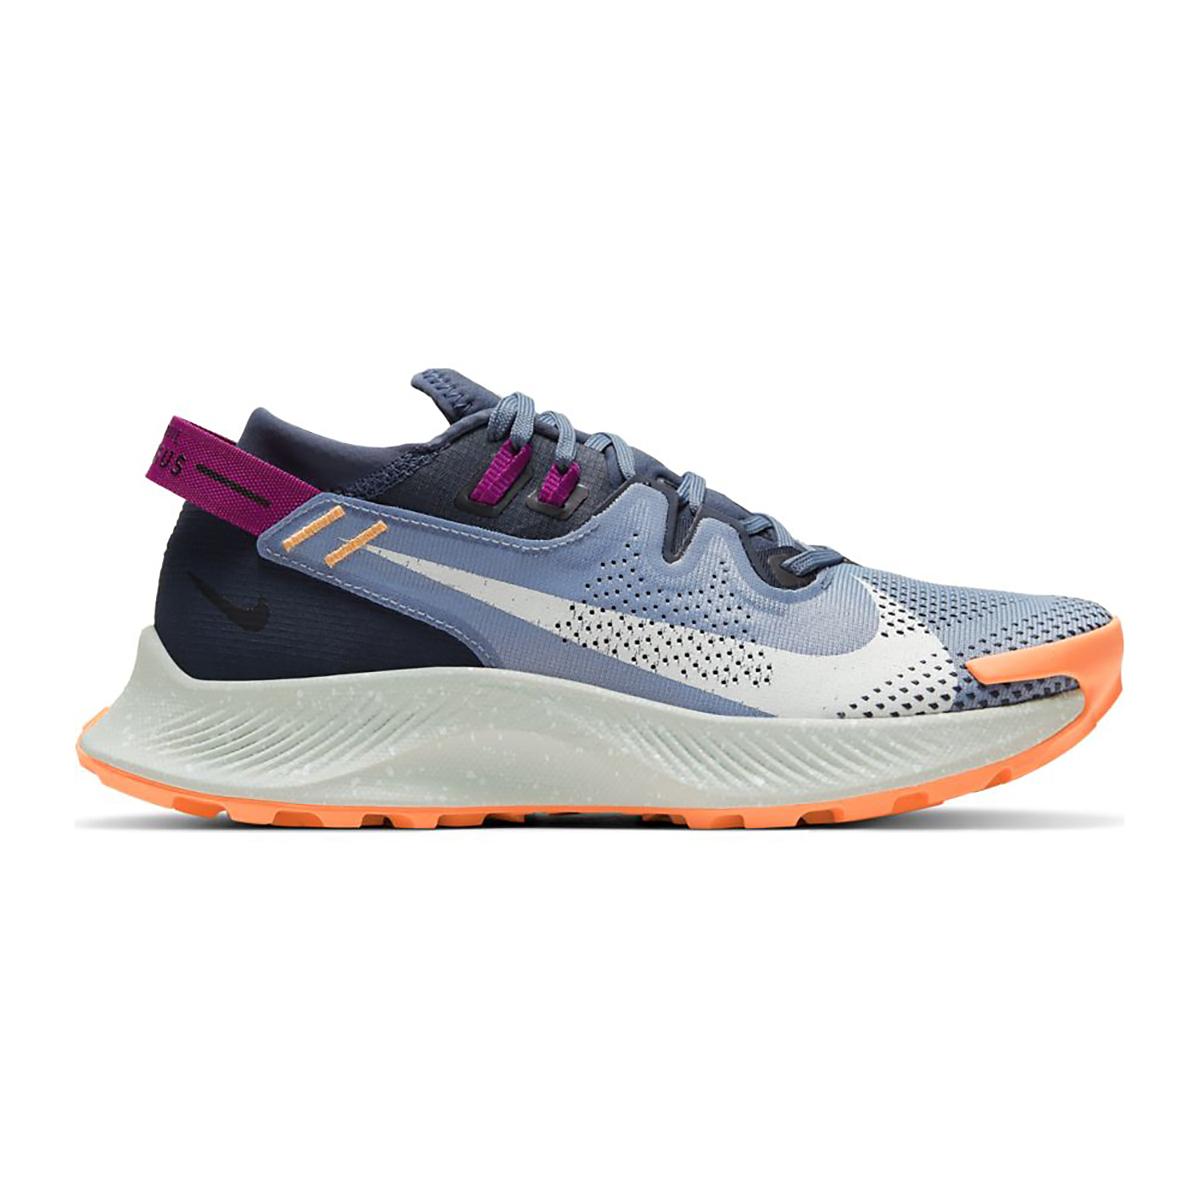 Women's Nike Pegasus Trail 2 Trail Running Shoe - Color: Thunder Blue/Photon Dust/Ashen Slate - Size: 5 - Width: Regular, Thunder Blue/Photon Dust/Ashen Slate, large, image 1